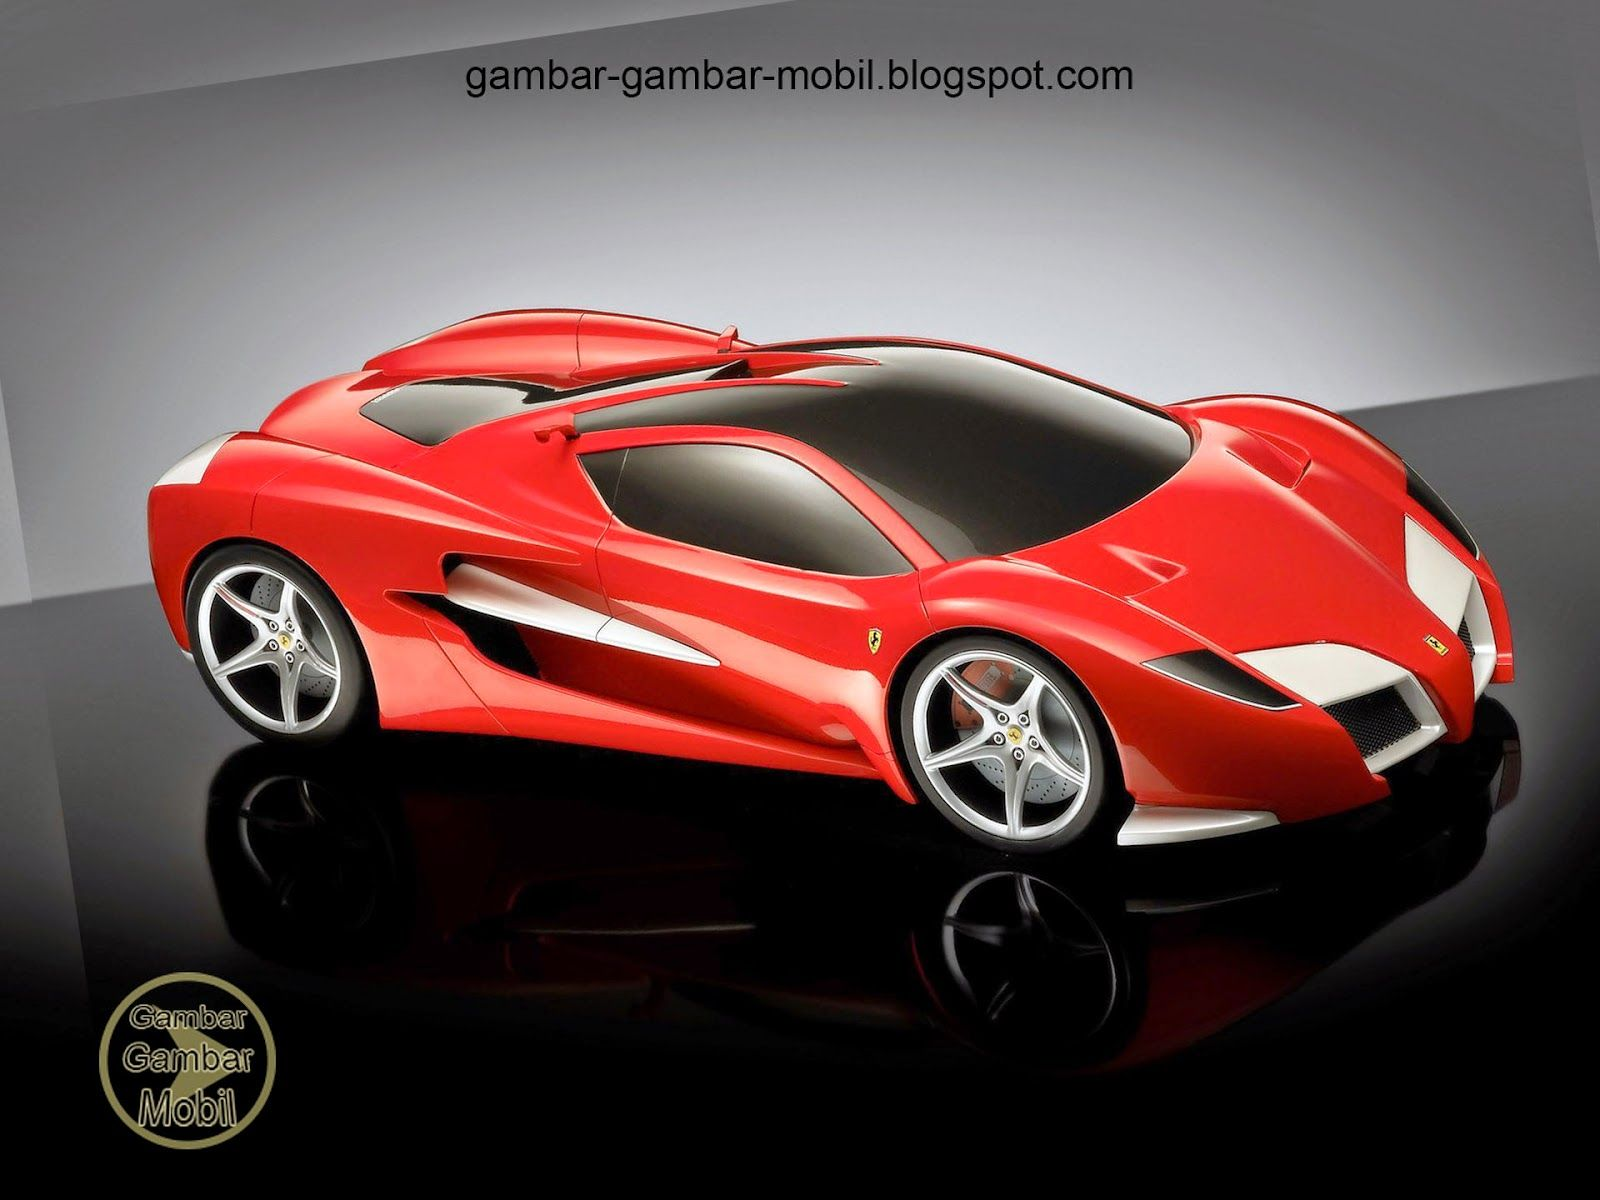 Foto Mobil Ferrari Modif Terbaru Modifikasi Style